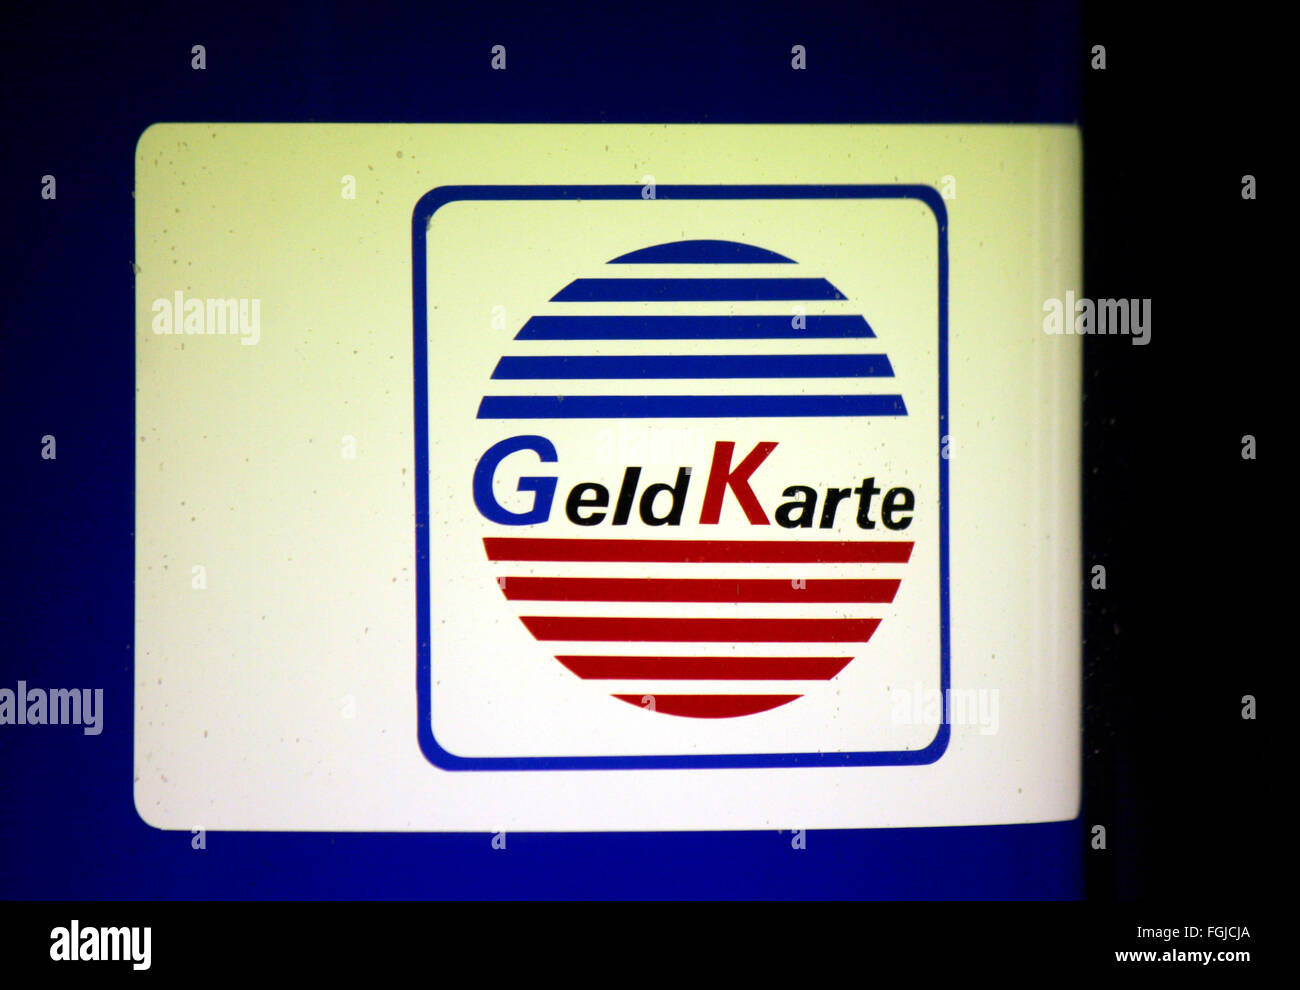 Markenname: 'Geld Karte', Berlin. - Stock Image